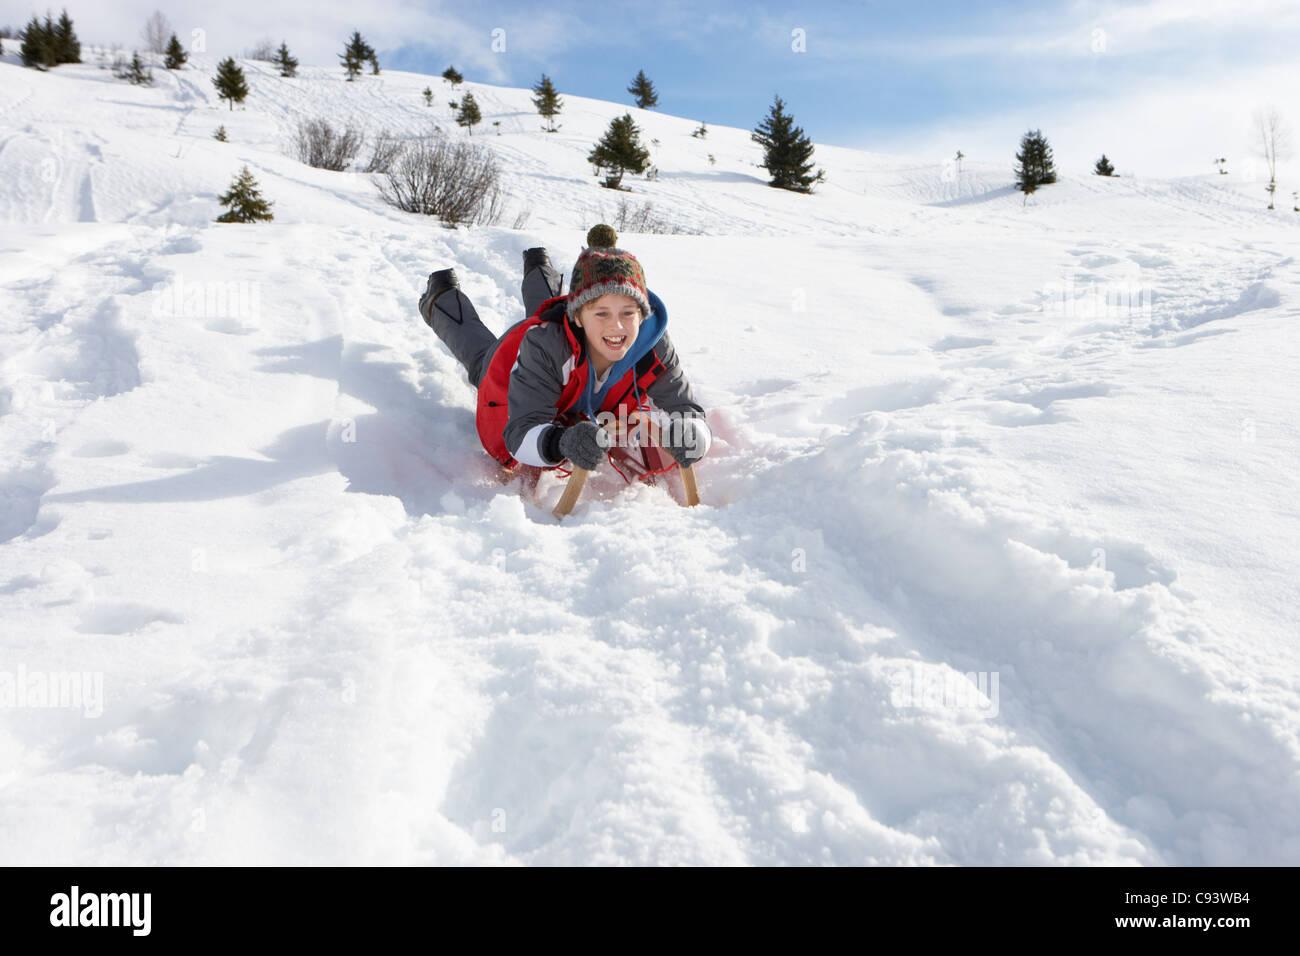 Pre Teen Boy On A Sled In The Snow